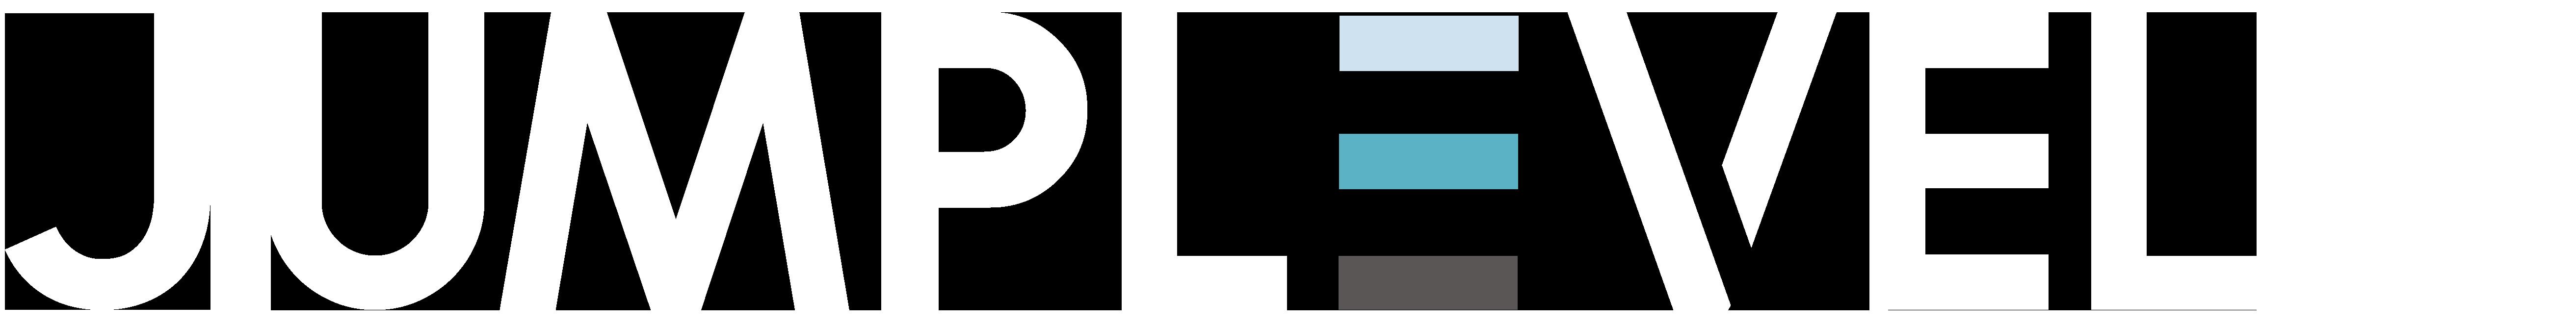 JUMPLEVEL logo transp 5250 links